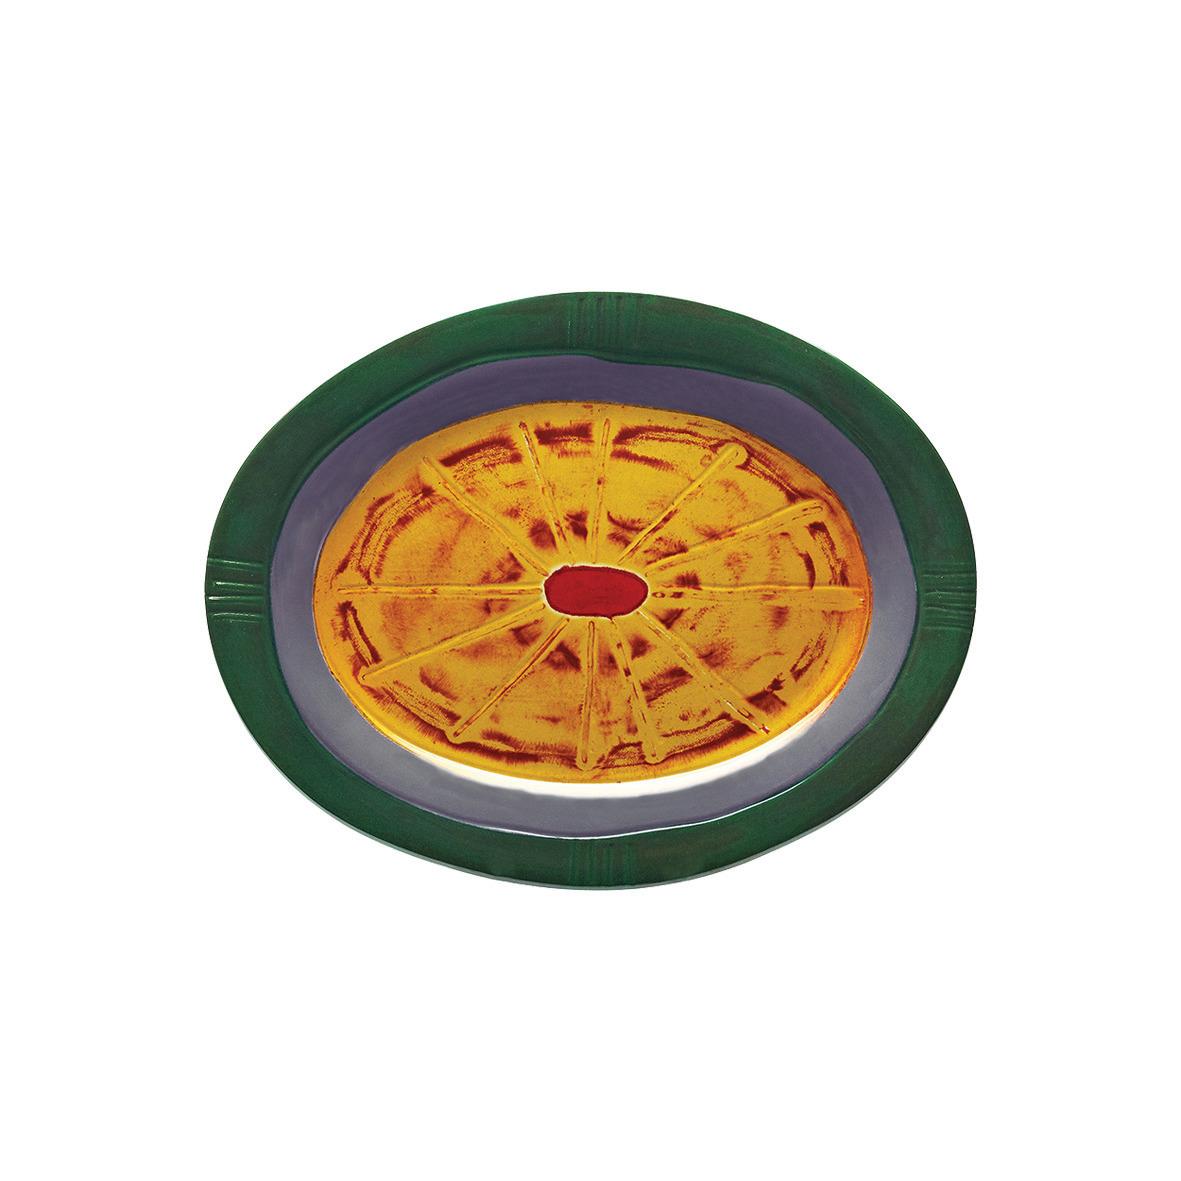 Platte oval 377 x 296 mm bunt